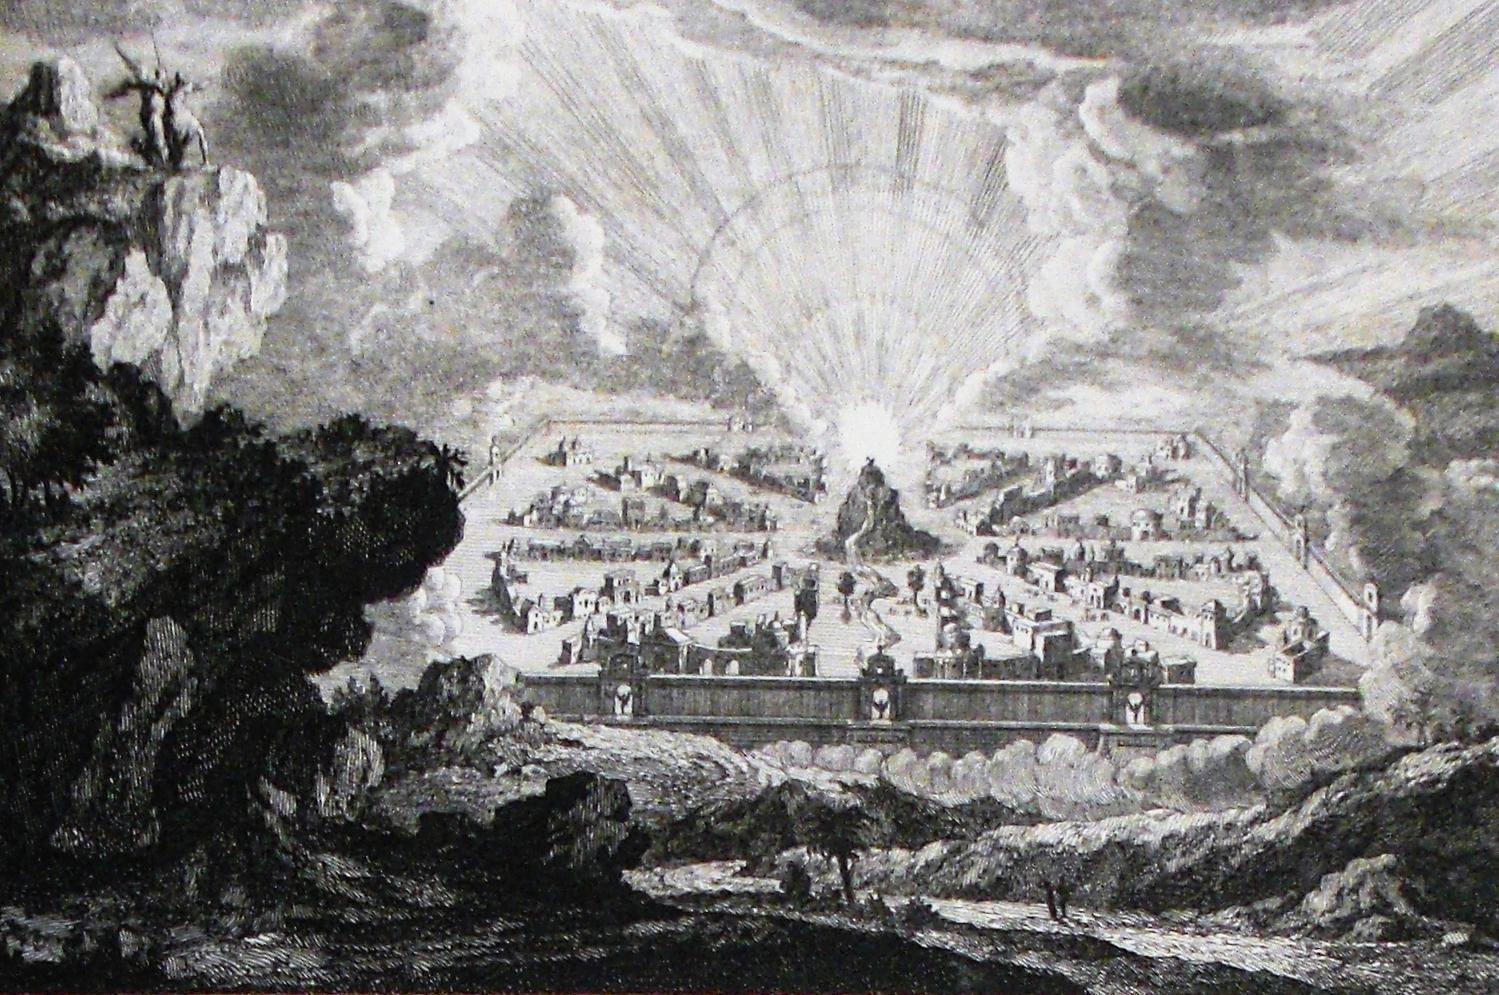 image relating to Printable Revelation Bible Study named Refreshing Environment (Christianity) - Wikipedia